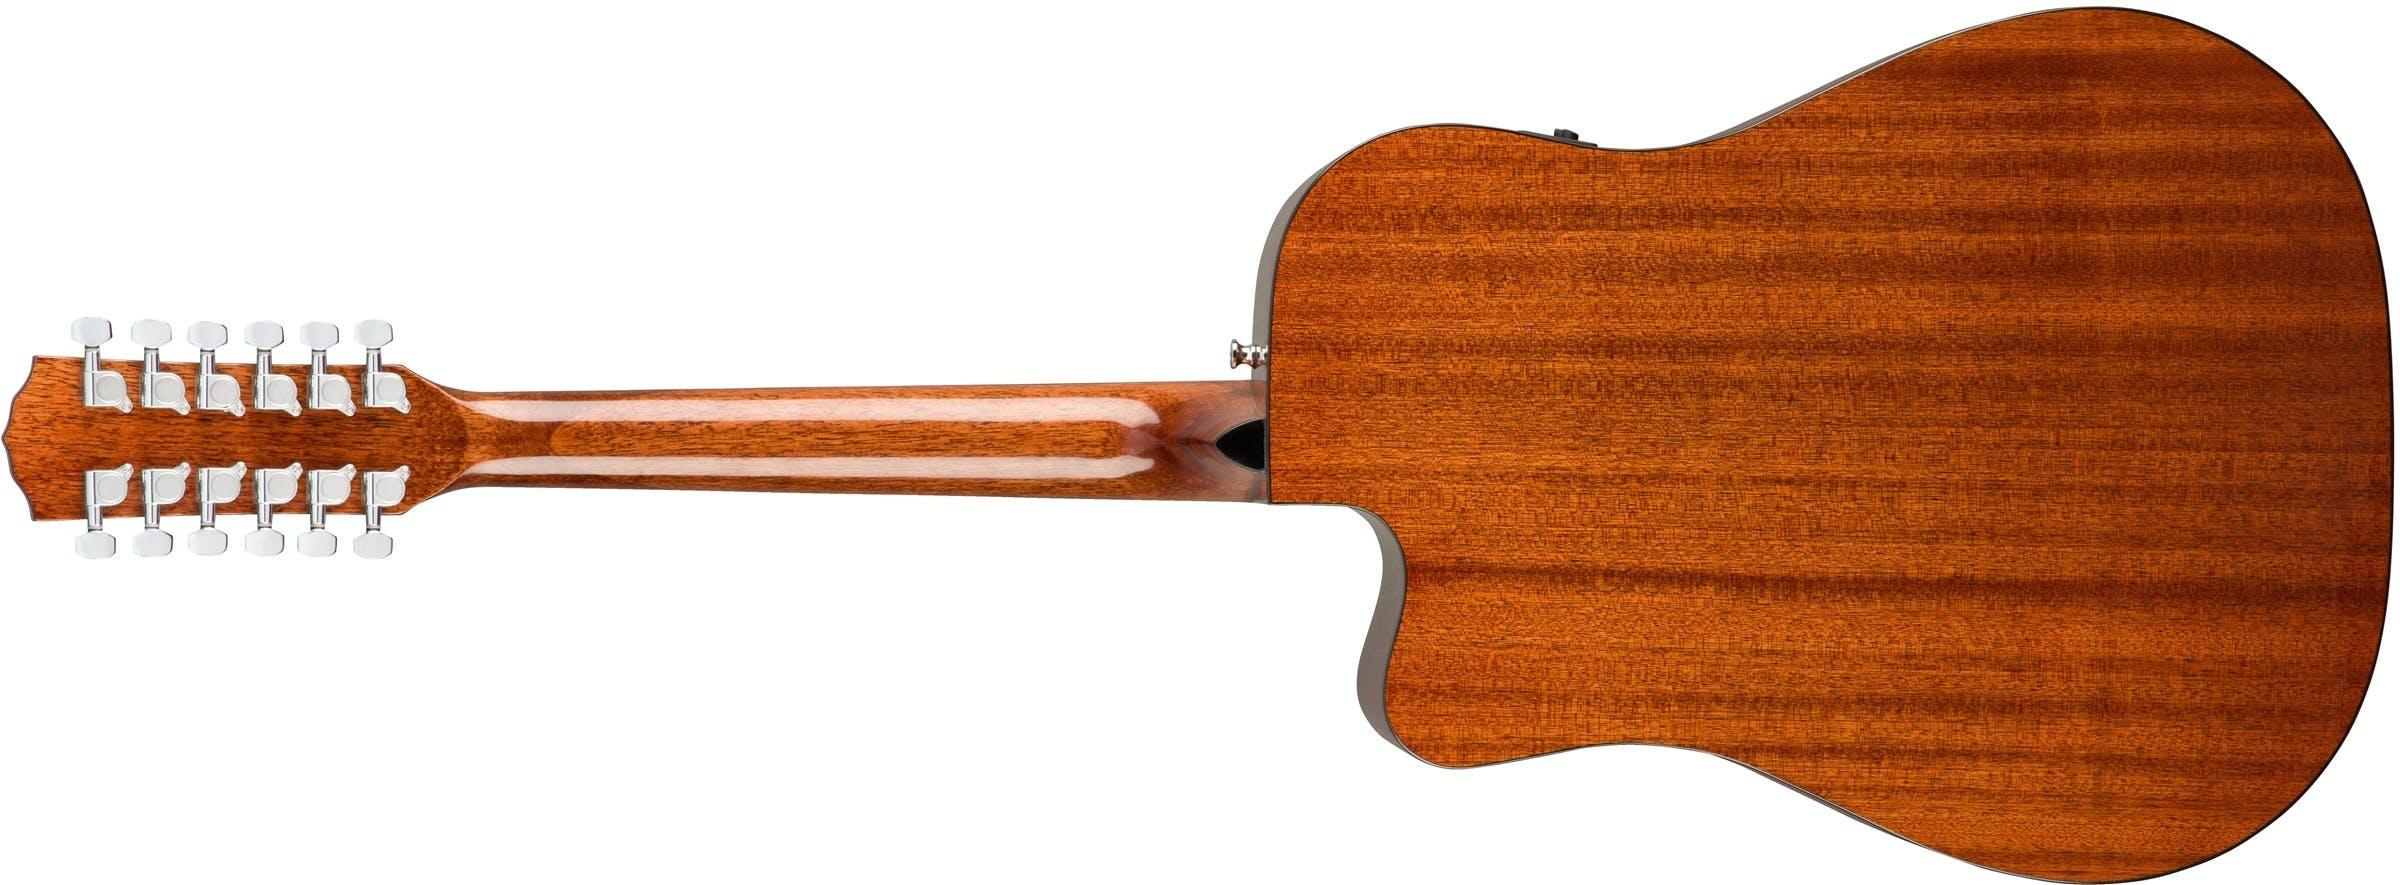 fender cd60sce cutaway electro acoustic 12 string guitar natural Fender Headstock fender cd60sce cutaway electro acoustic 12 string guitar natural